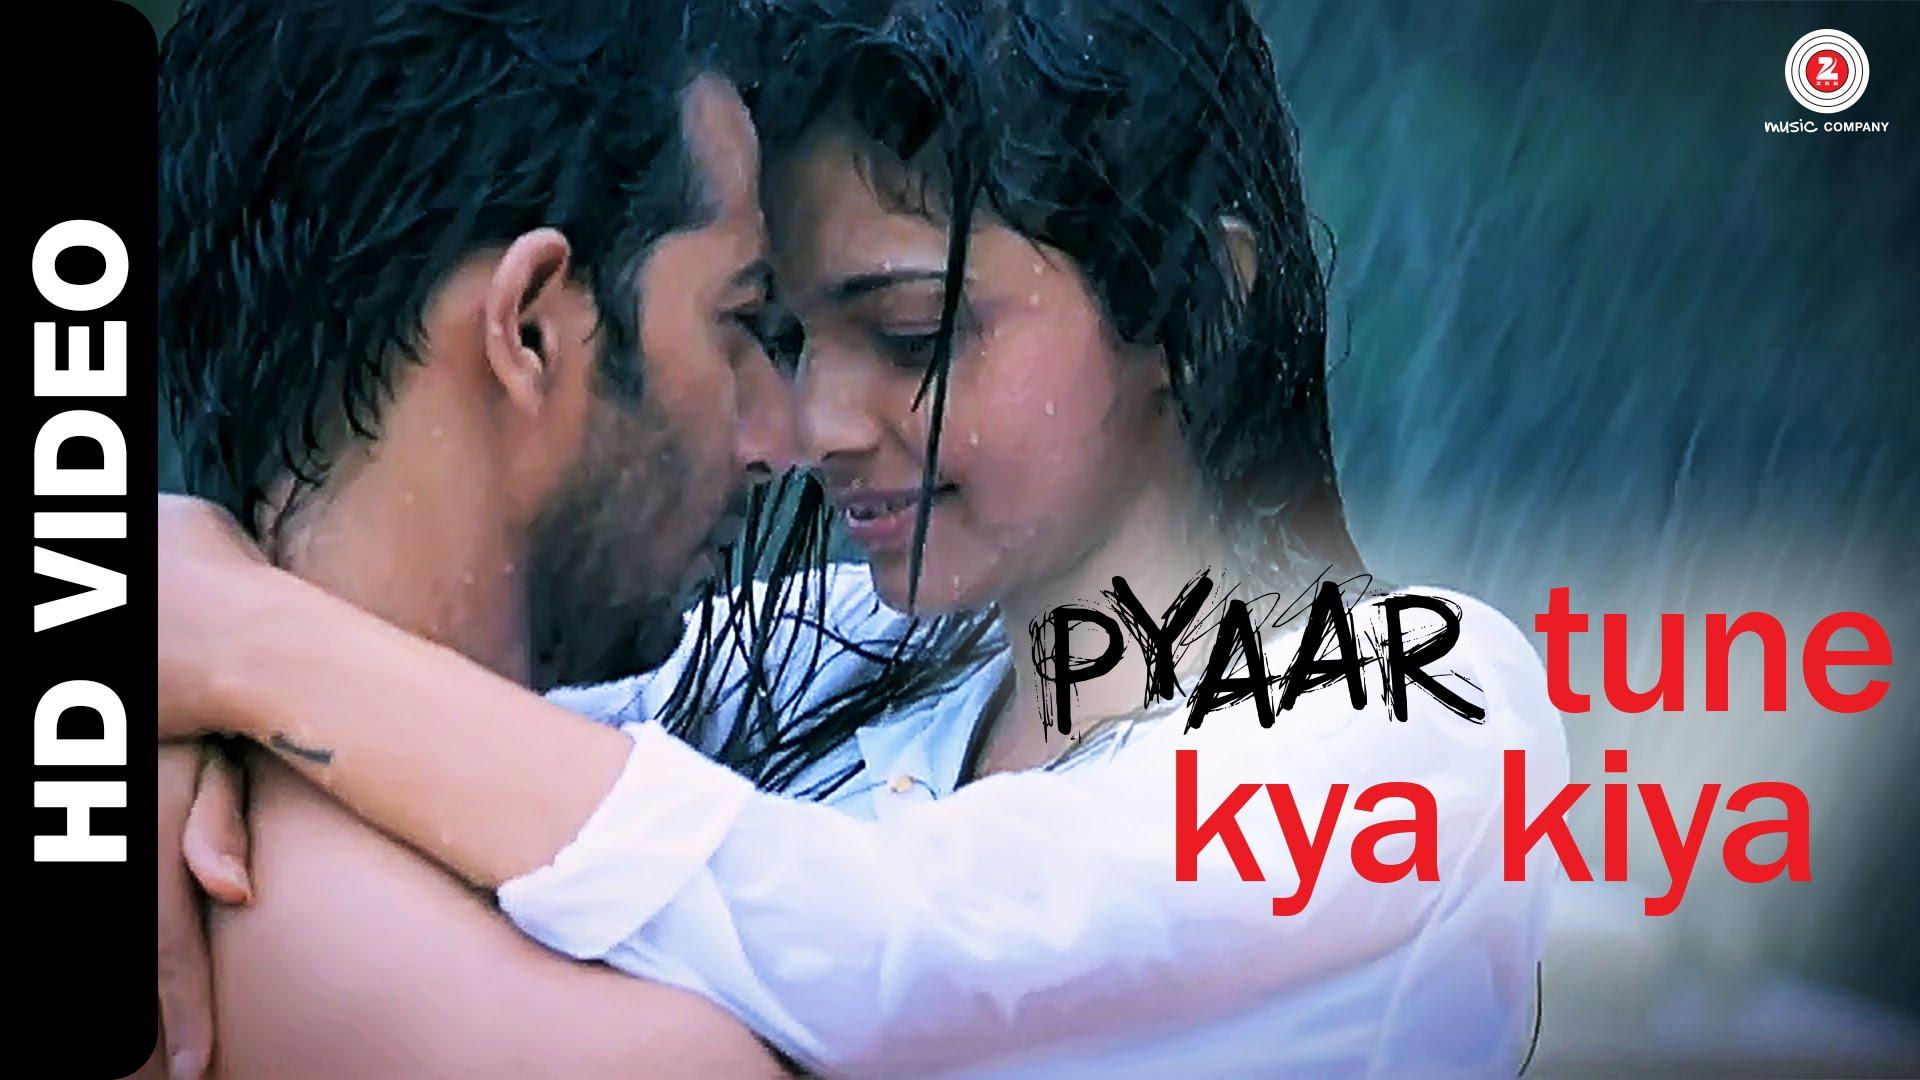 Pyaar Tune Kya Kiya Image